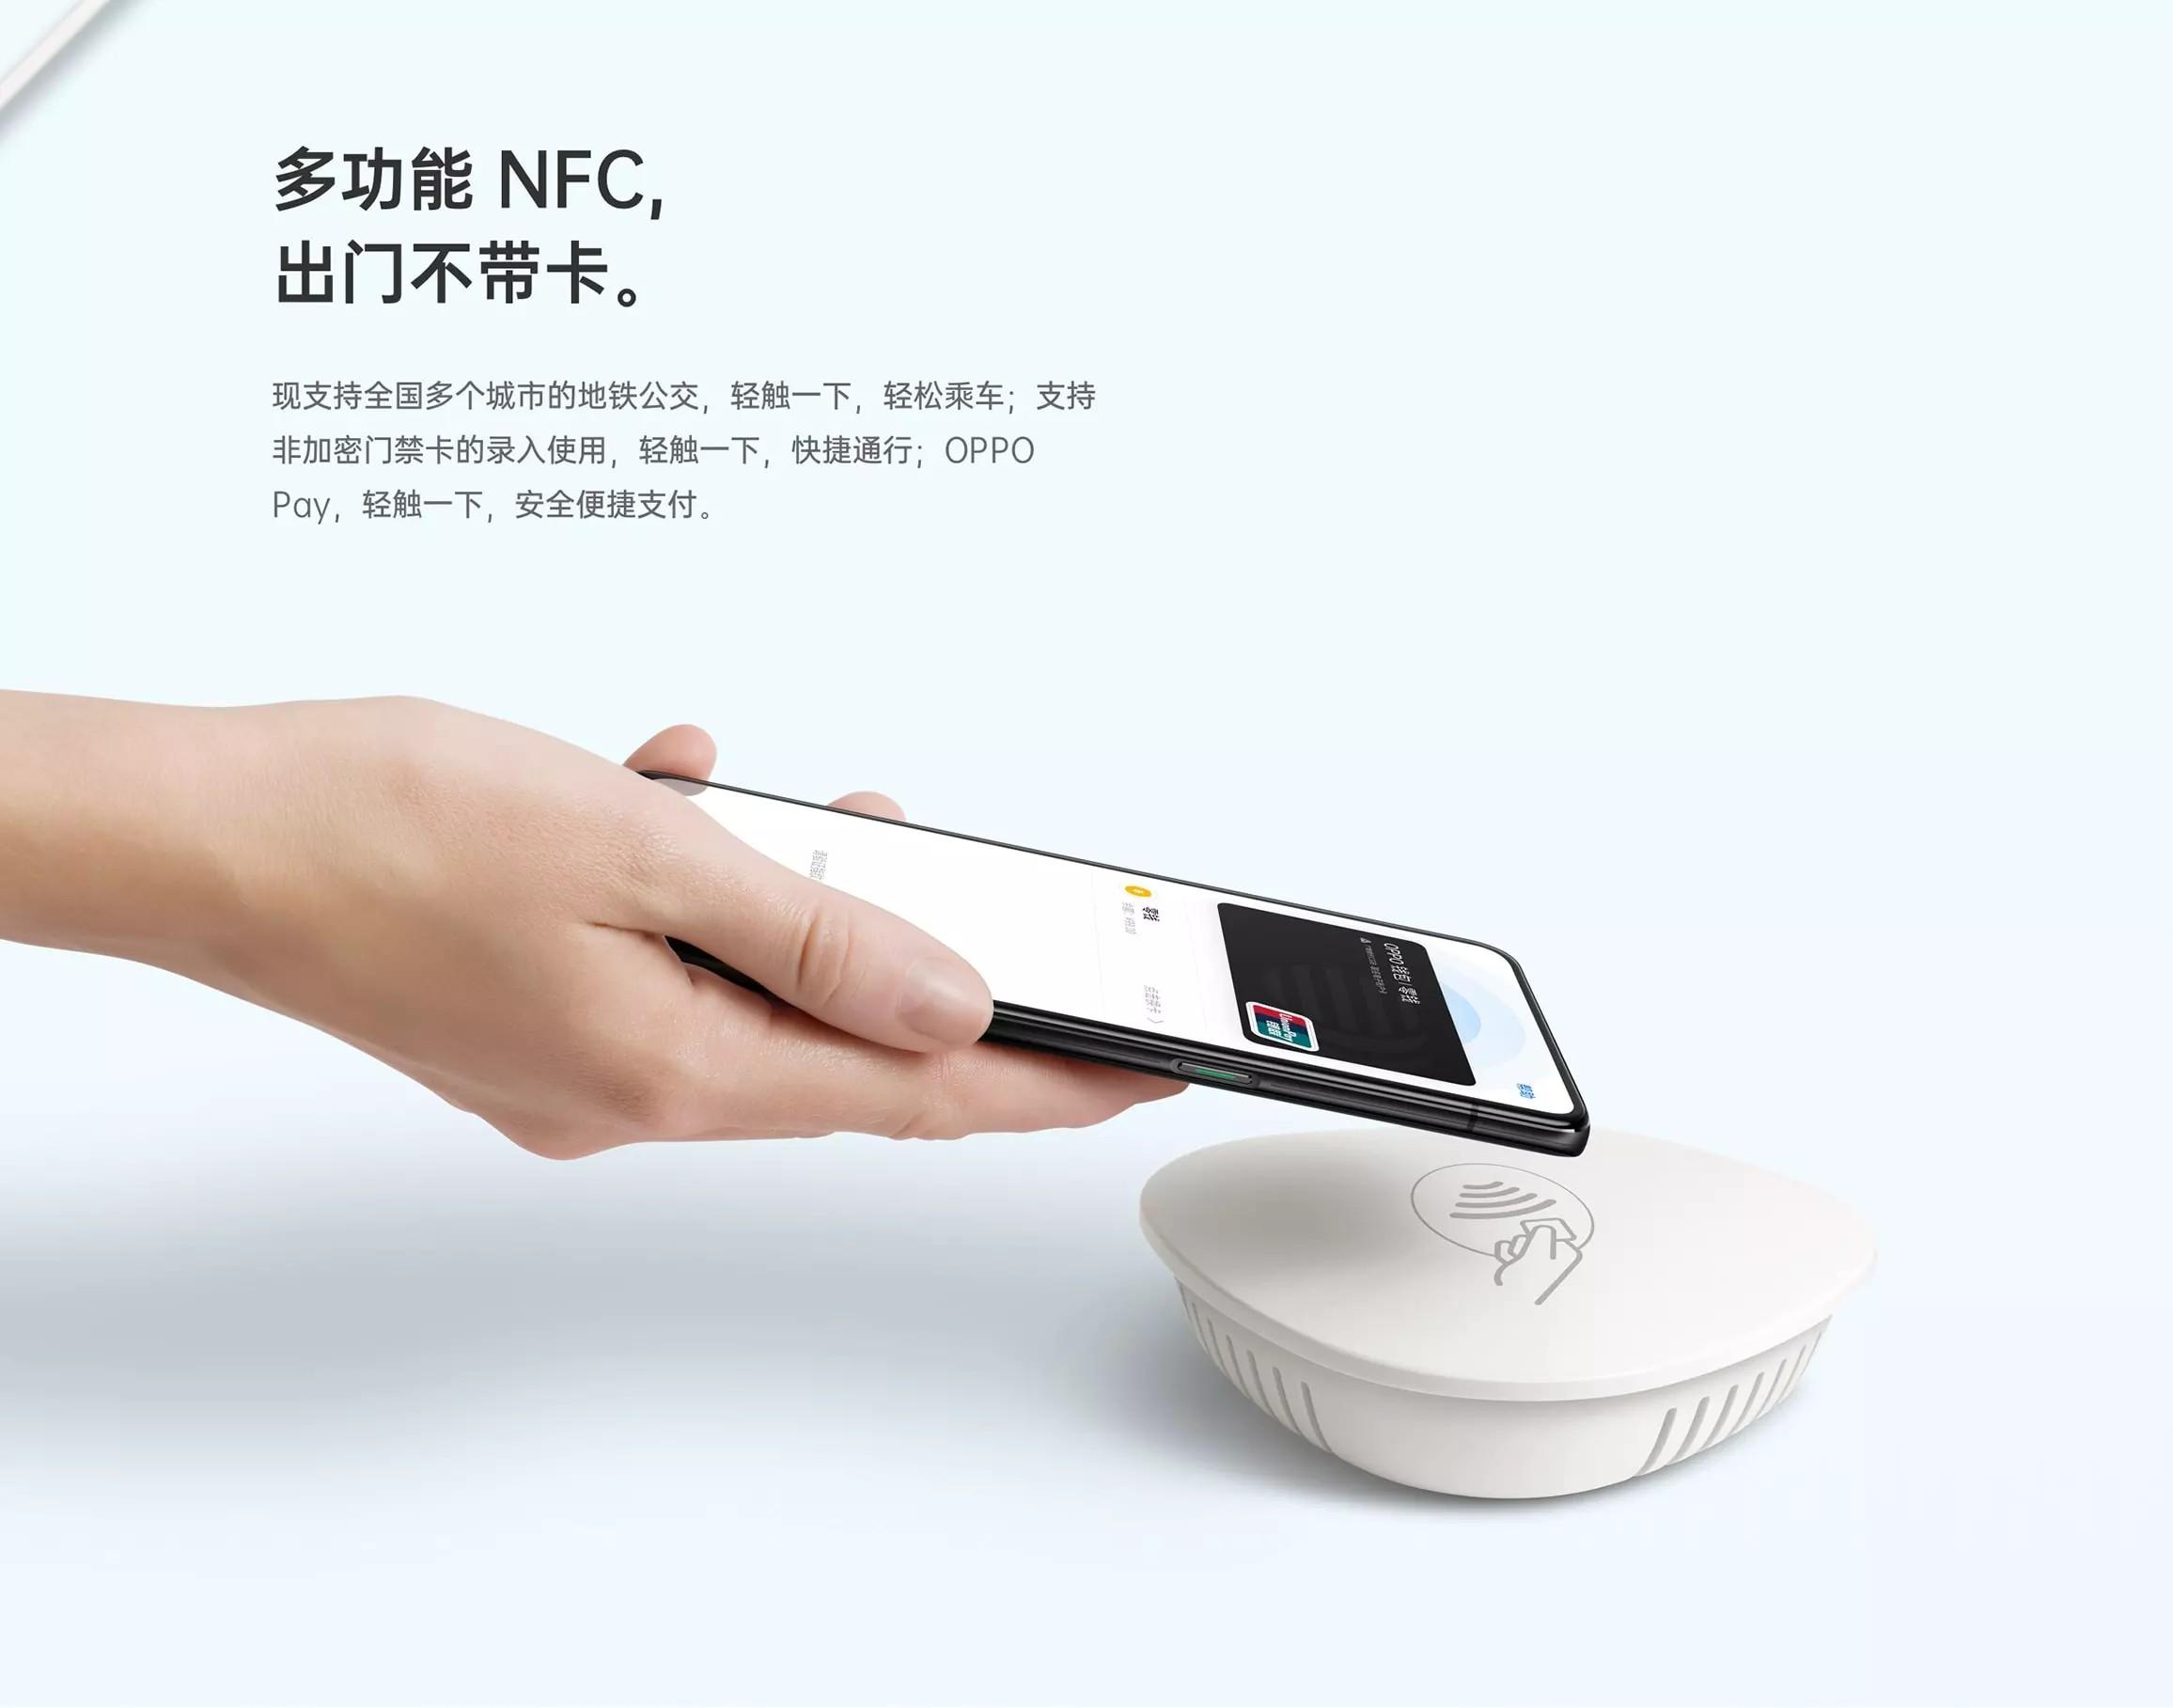 Reno Z 支援 NFC 功能